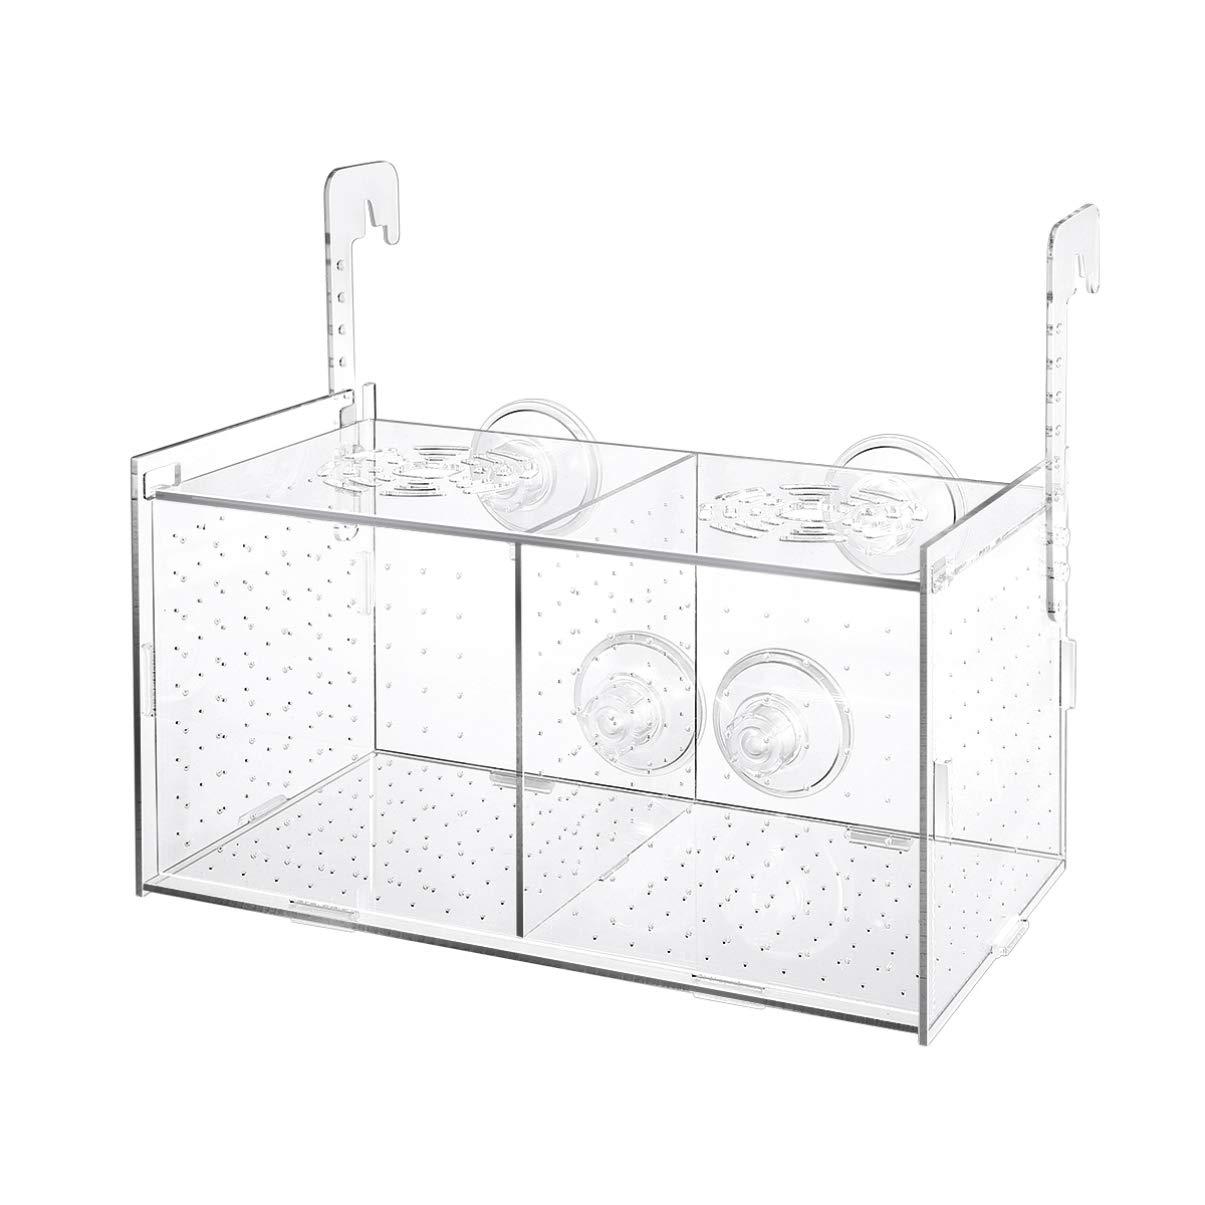 POPETPOP Fish Breeding Box – Acrylic Fish Isolation Box Aquarium Hatchery Incubator with Suction Cups for Baby Fishes…